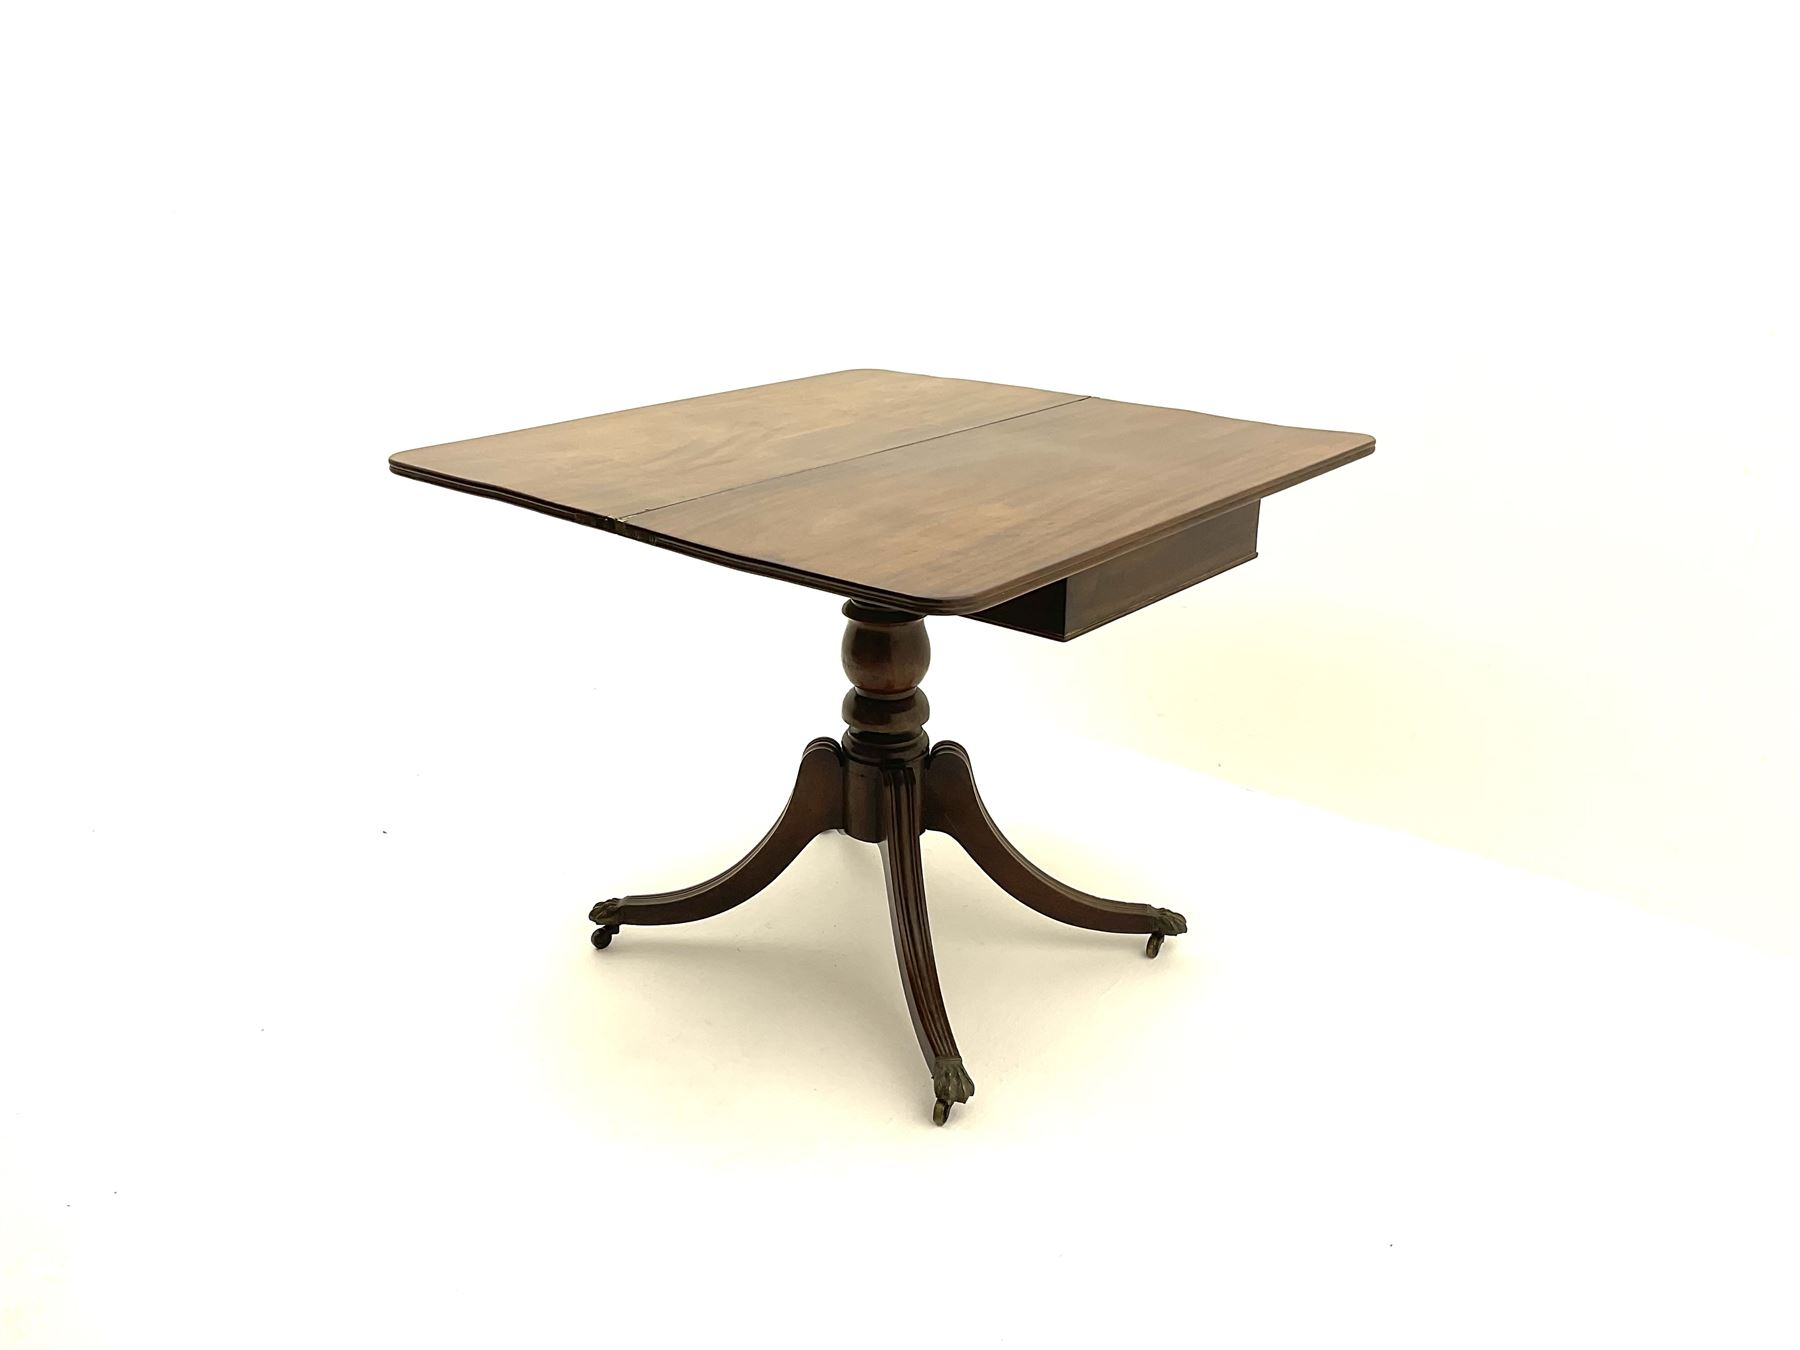 Regency mahogany pedestal table - Image 2 of 3